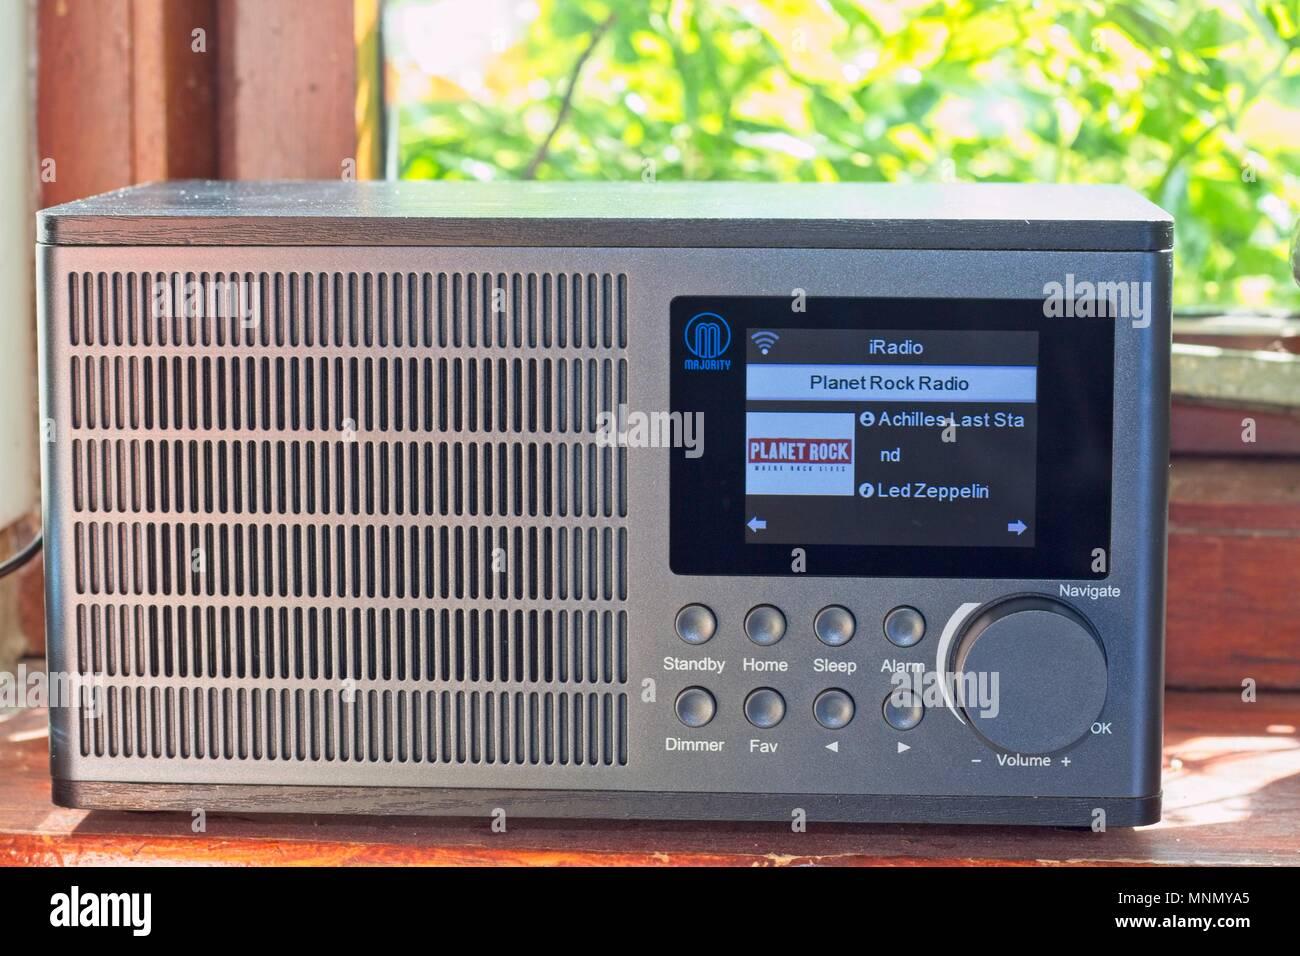 Badezimmer Radio Medion